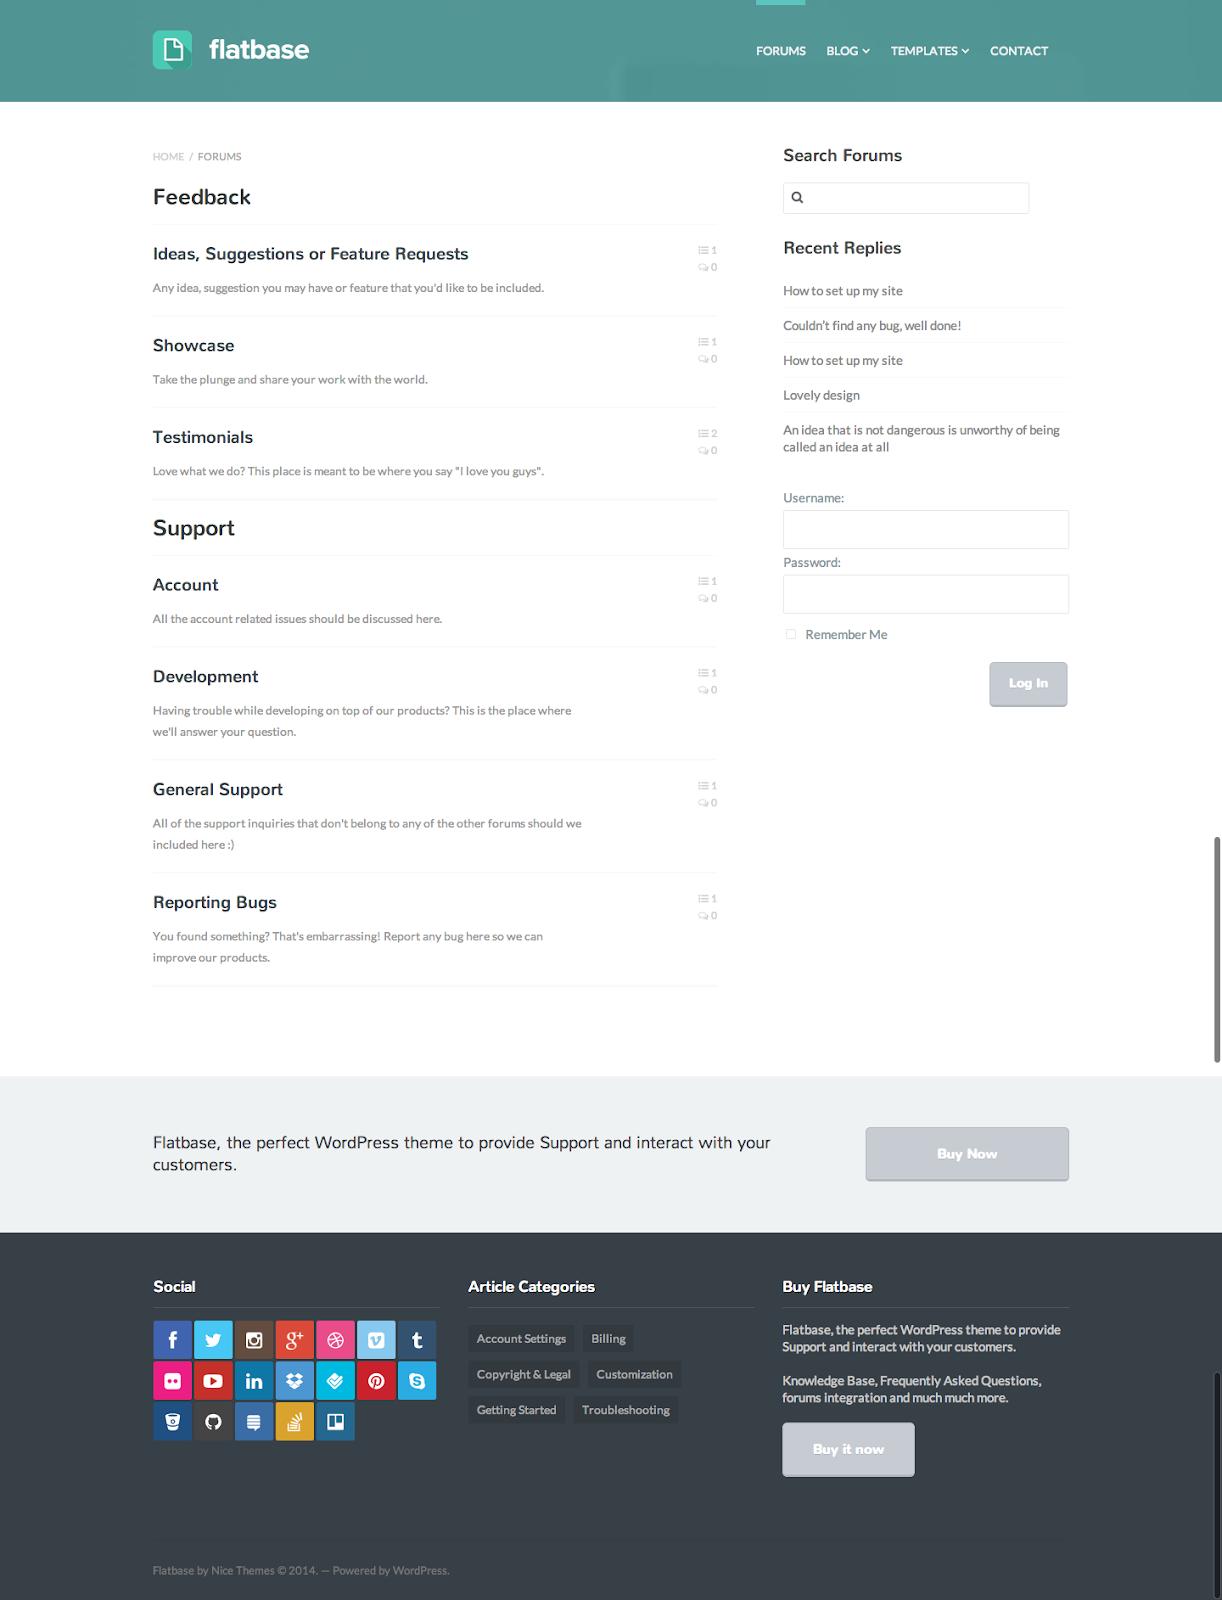 flatbase wordpress forum theme search functions demo